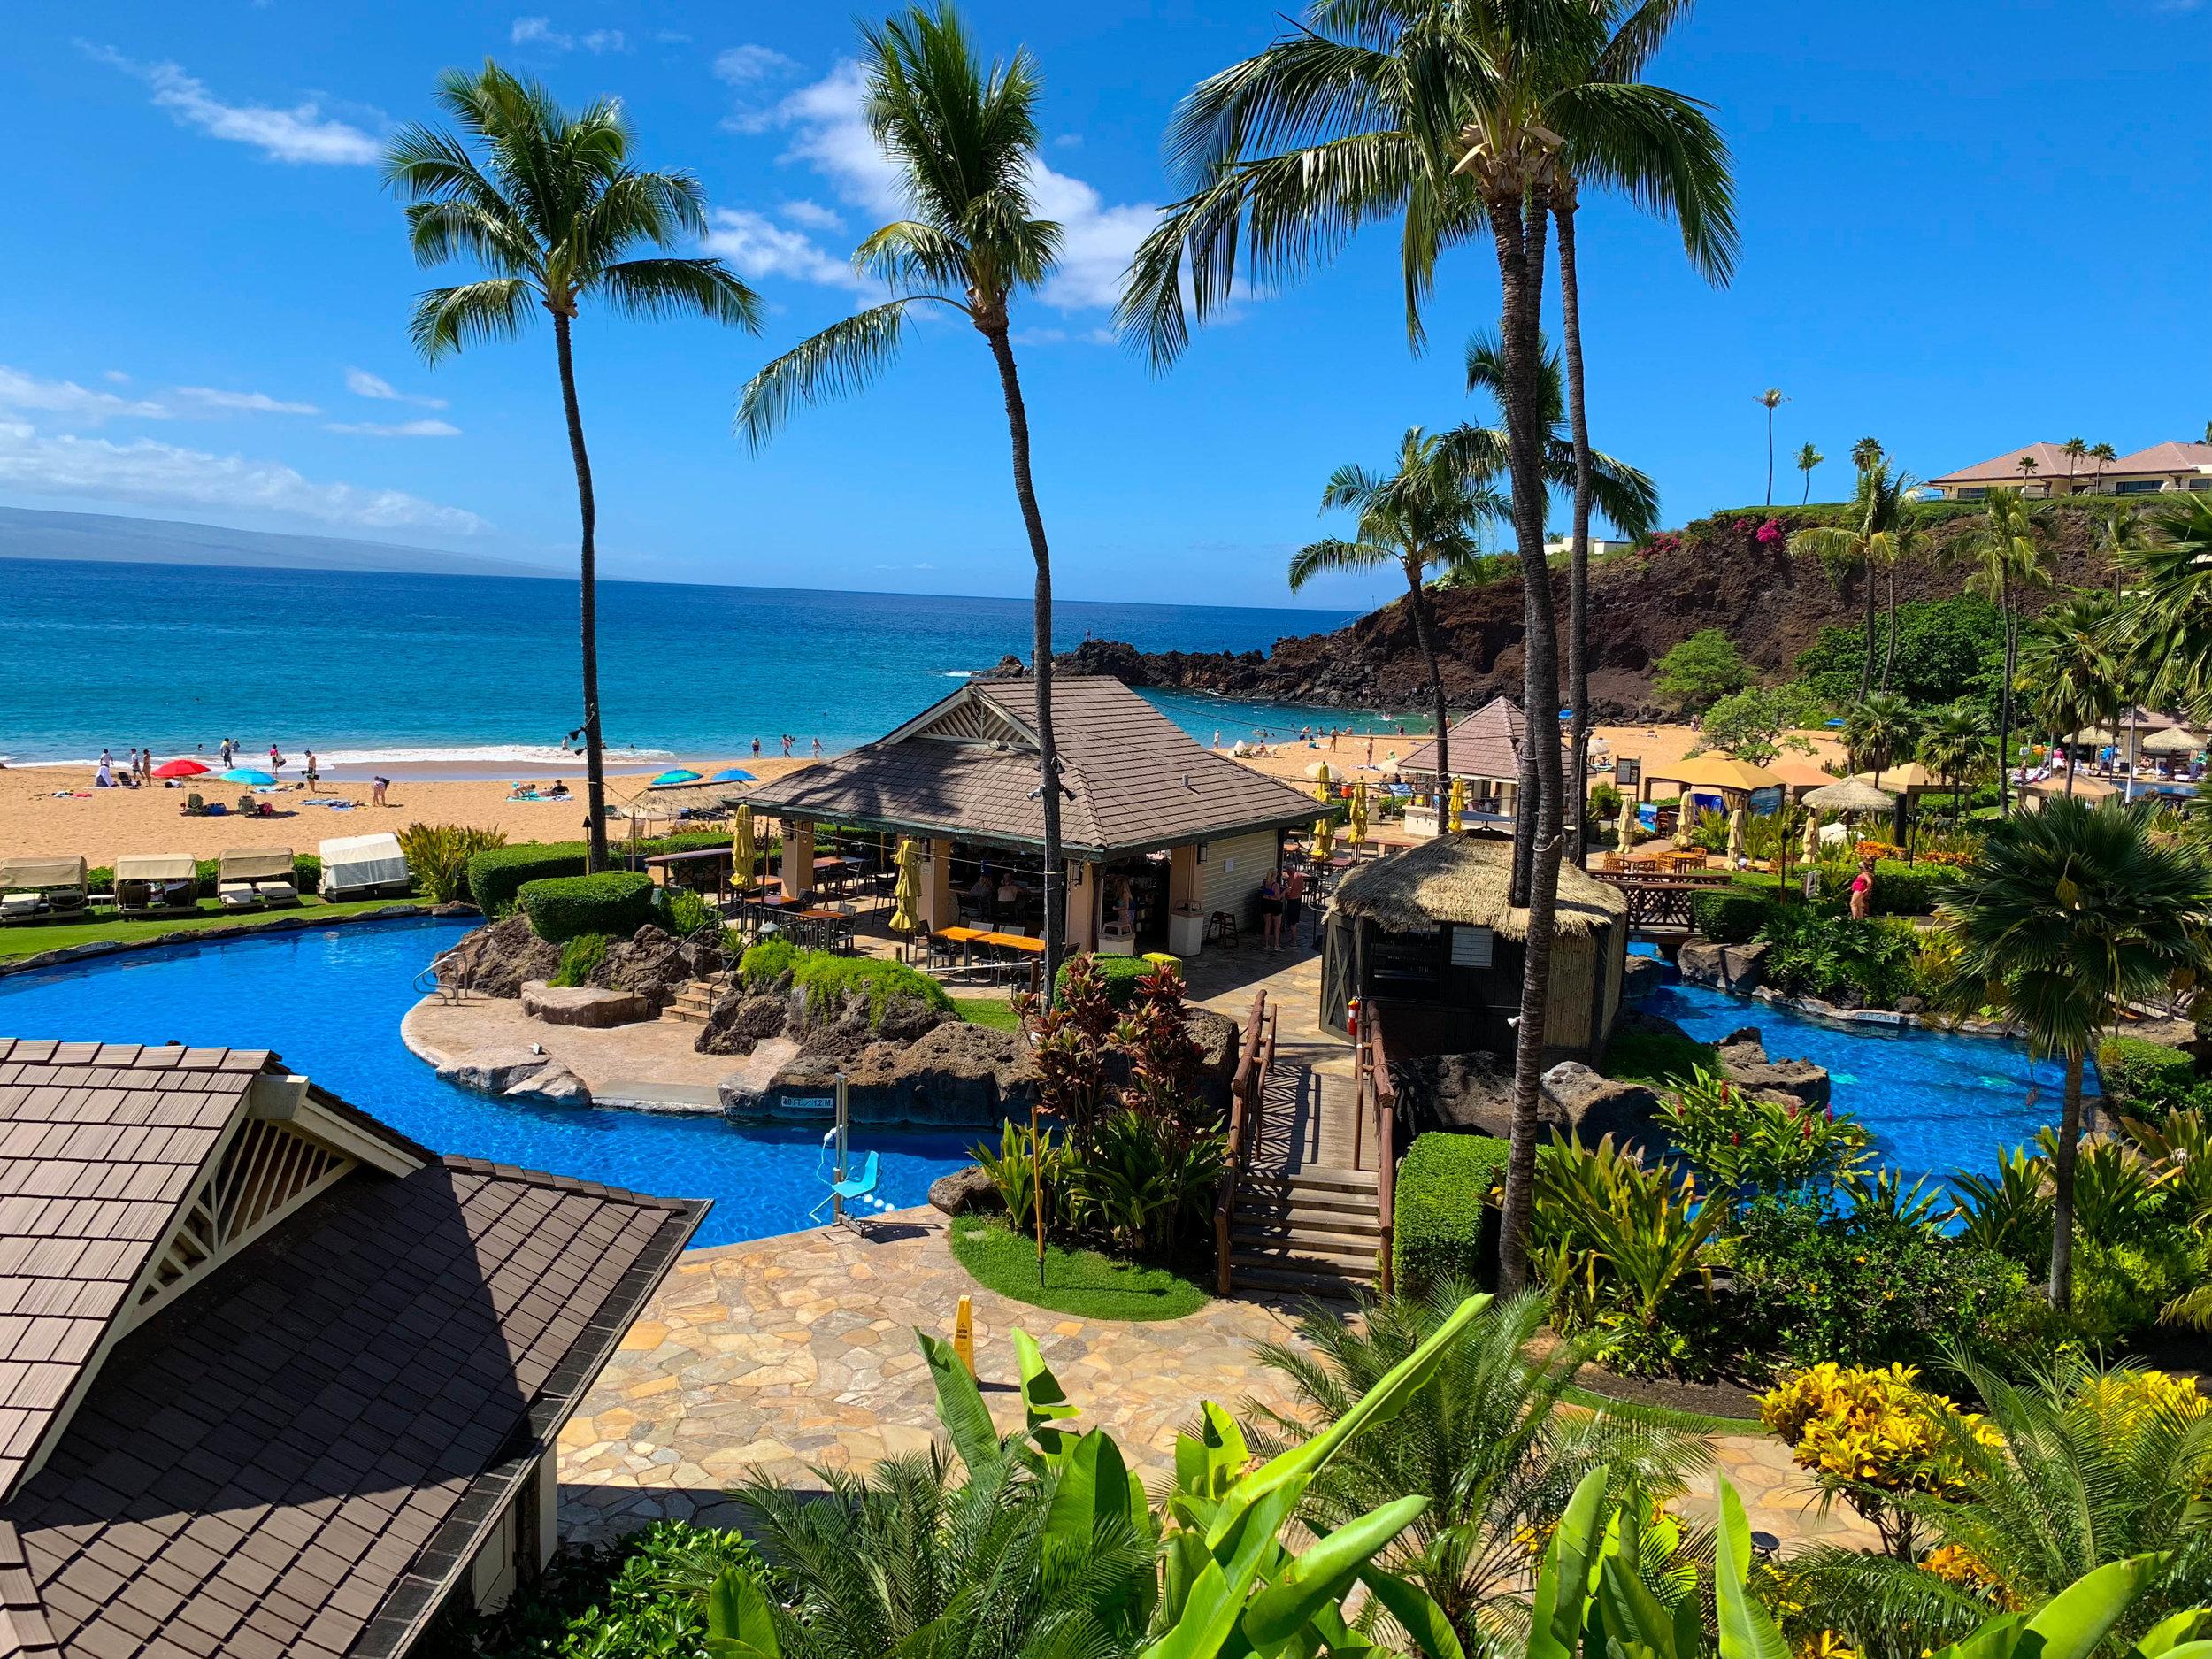 Sheraton Maui Hawaii Pool and Bar